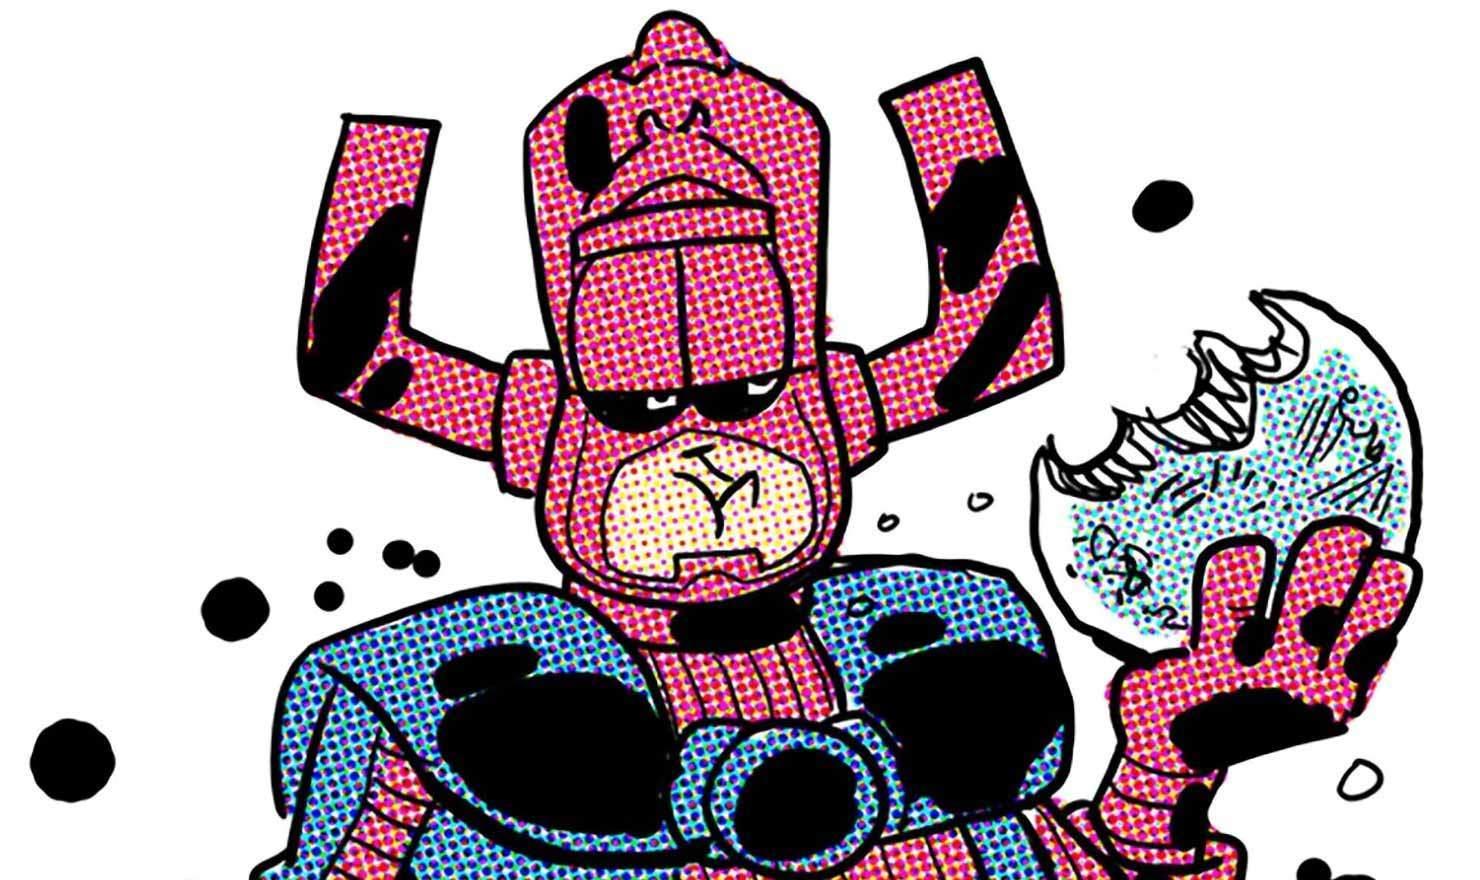 'Garfield' Creator Jim Davis Pens Galactus Story For Marvel Comics